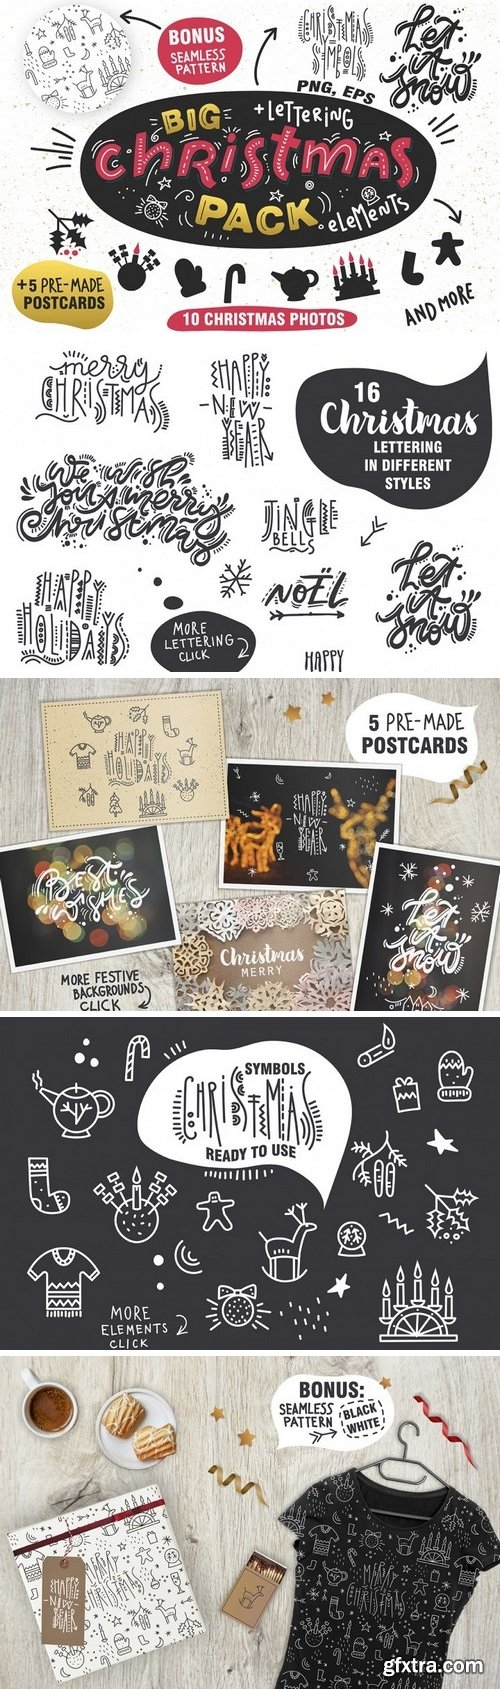 Thehungryjpeg - Big Christmas Pack 94683